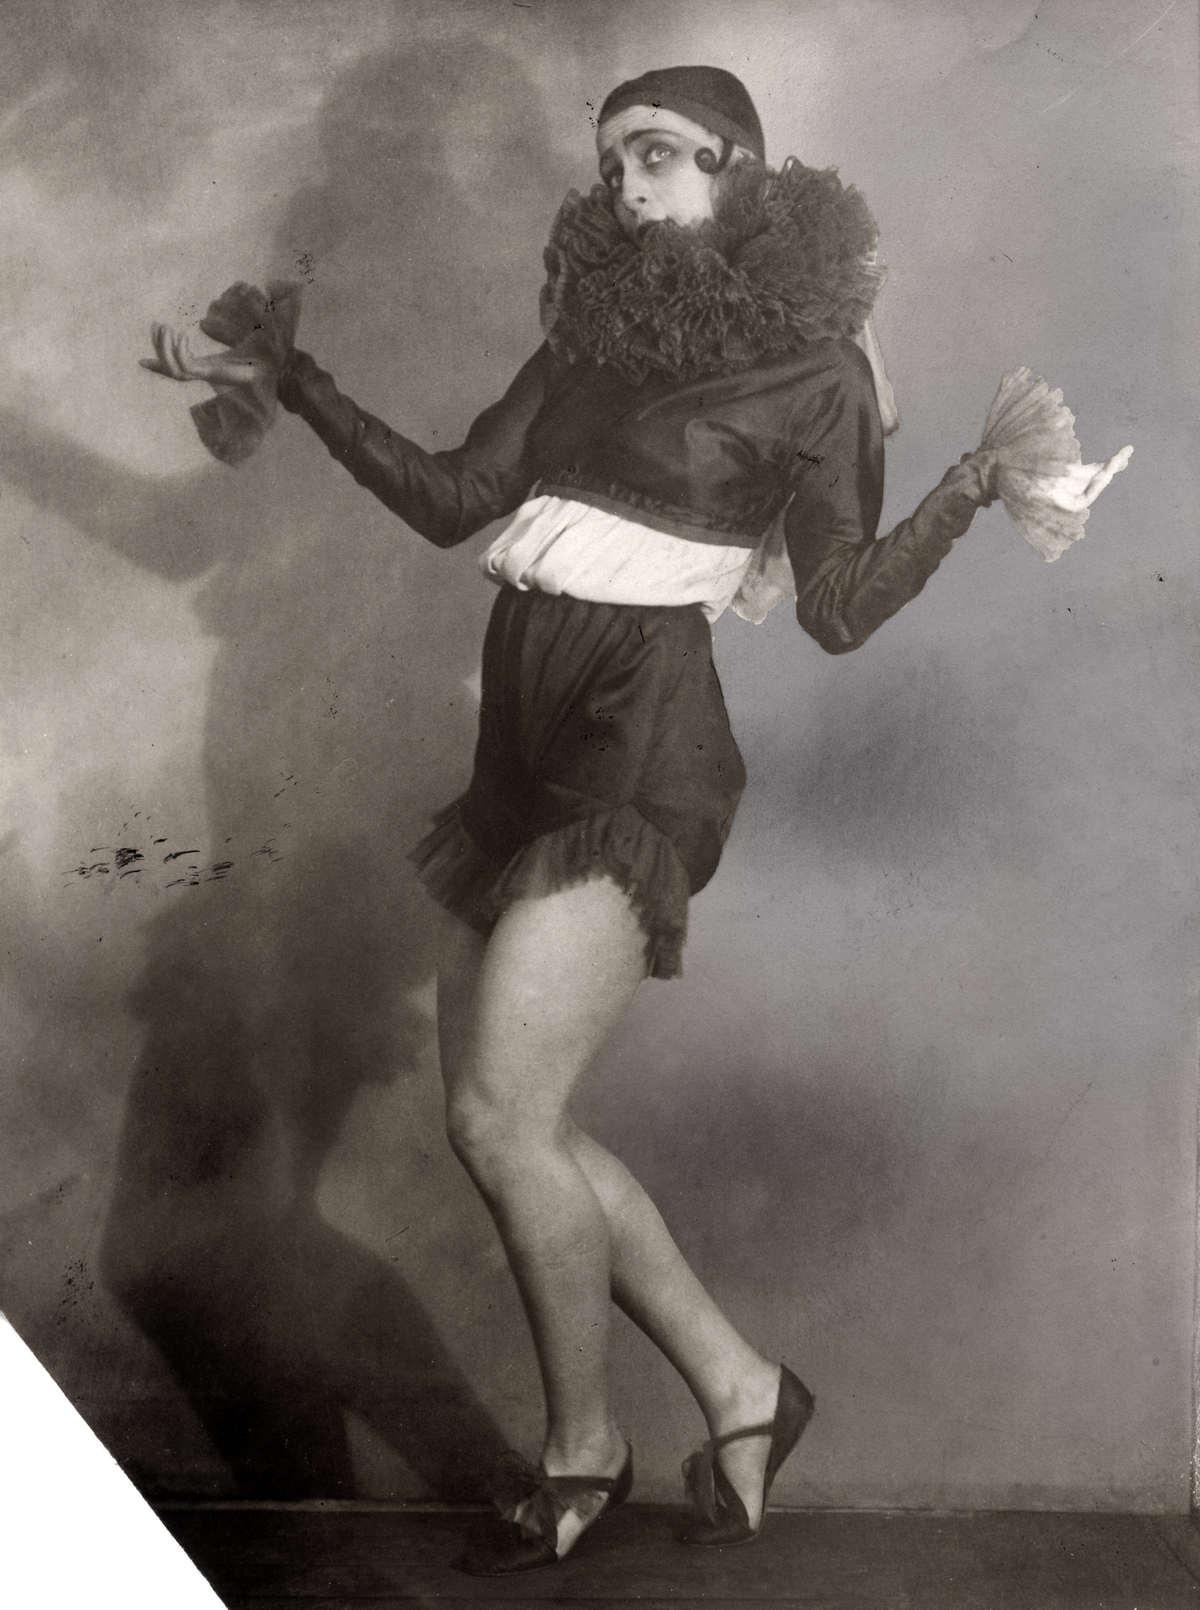 1926. Людмила Сперанцева, прима-балерина Большого театра